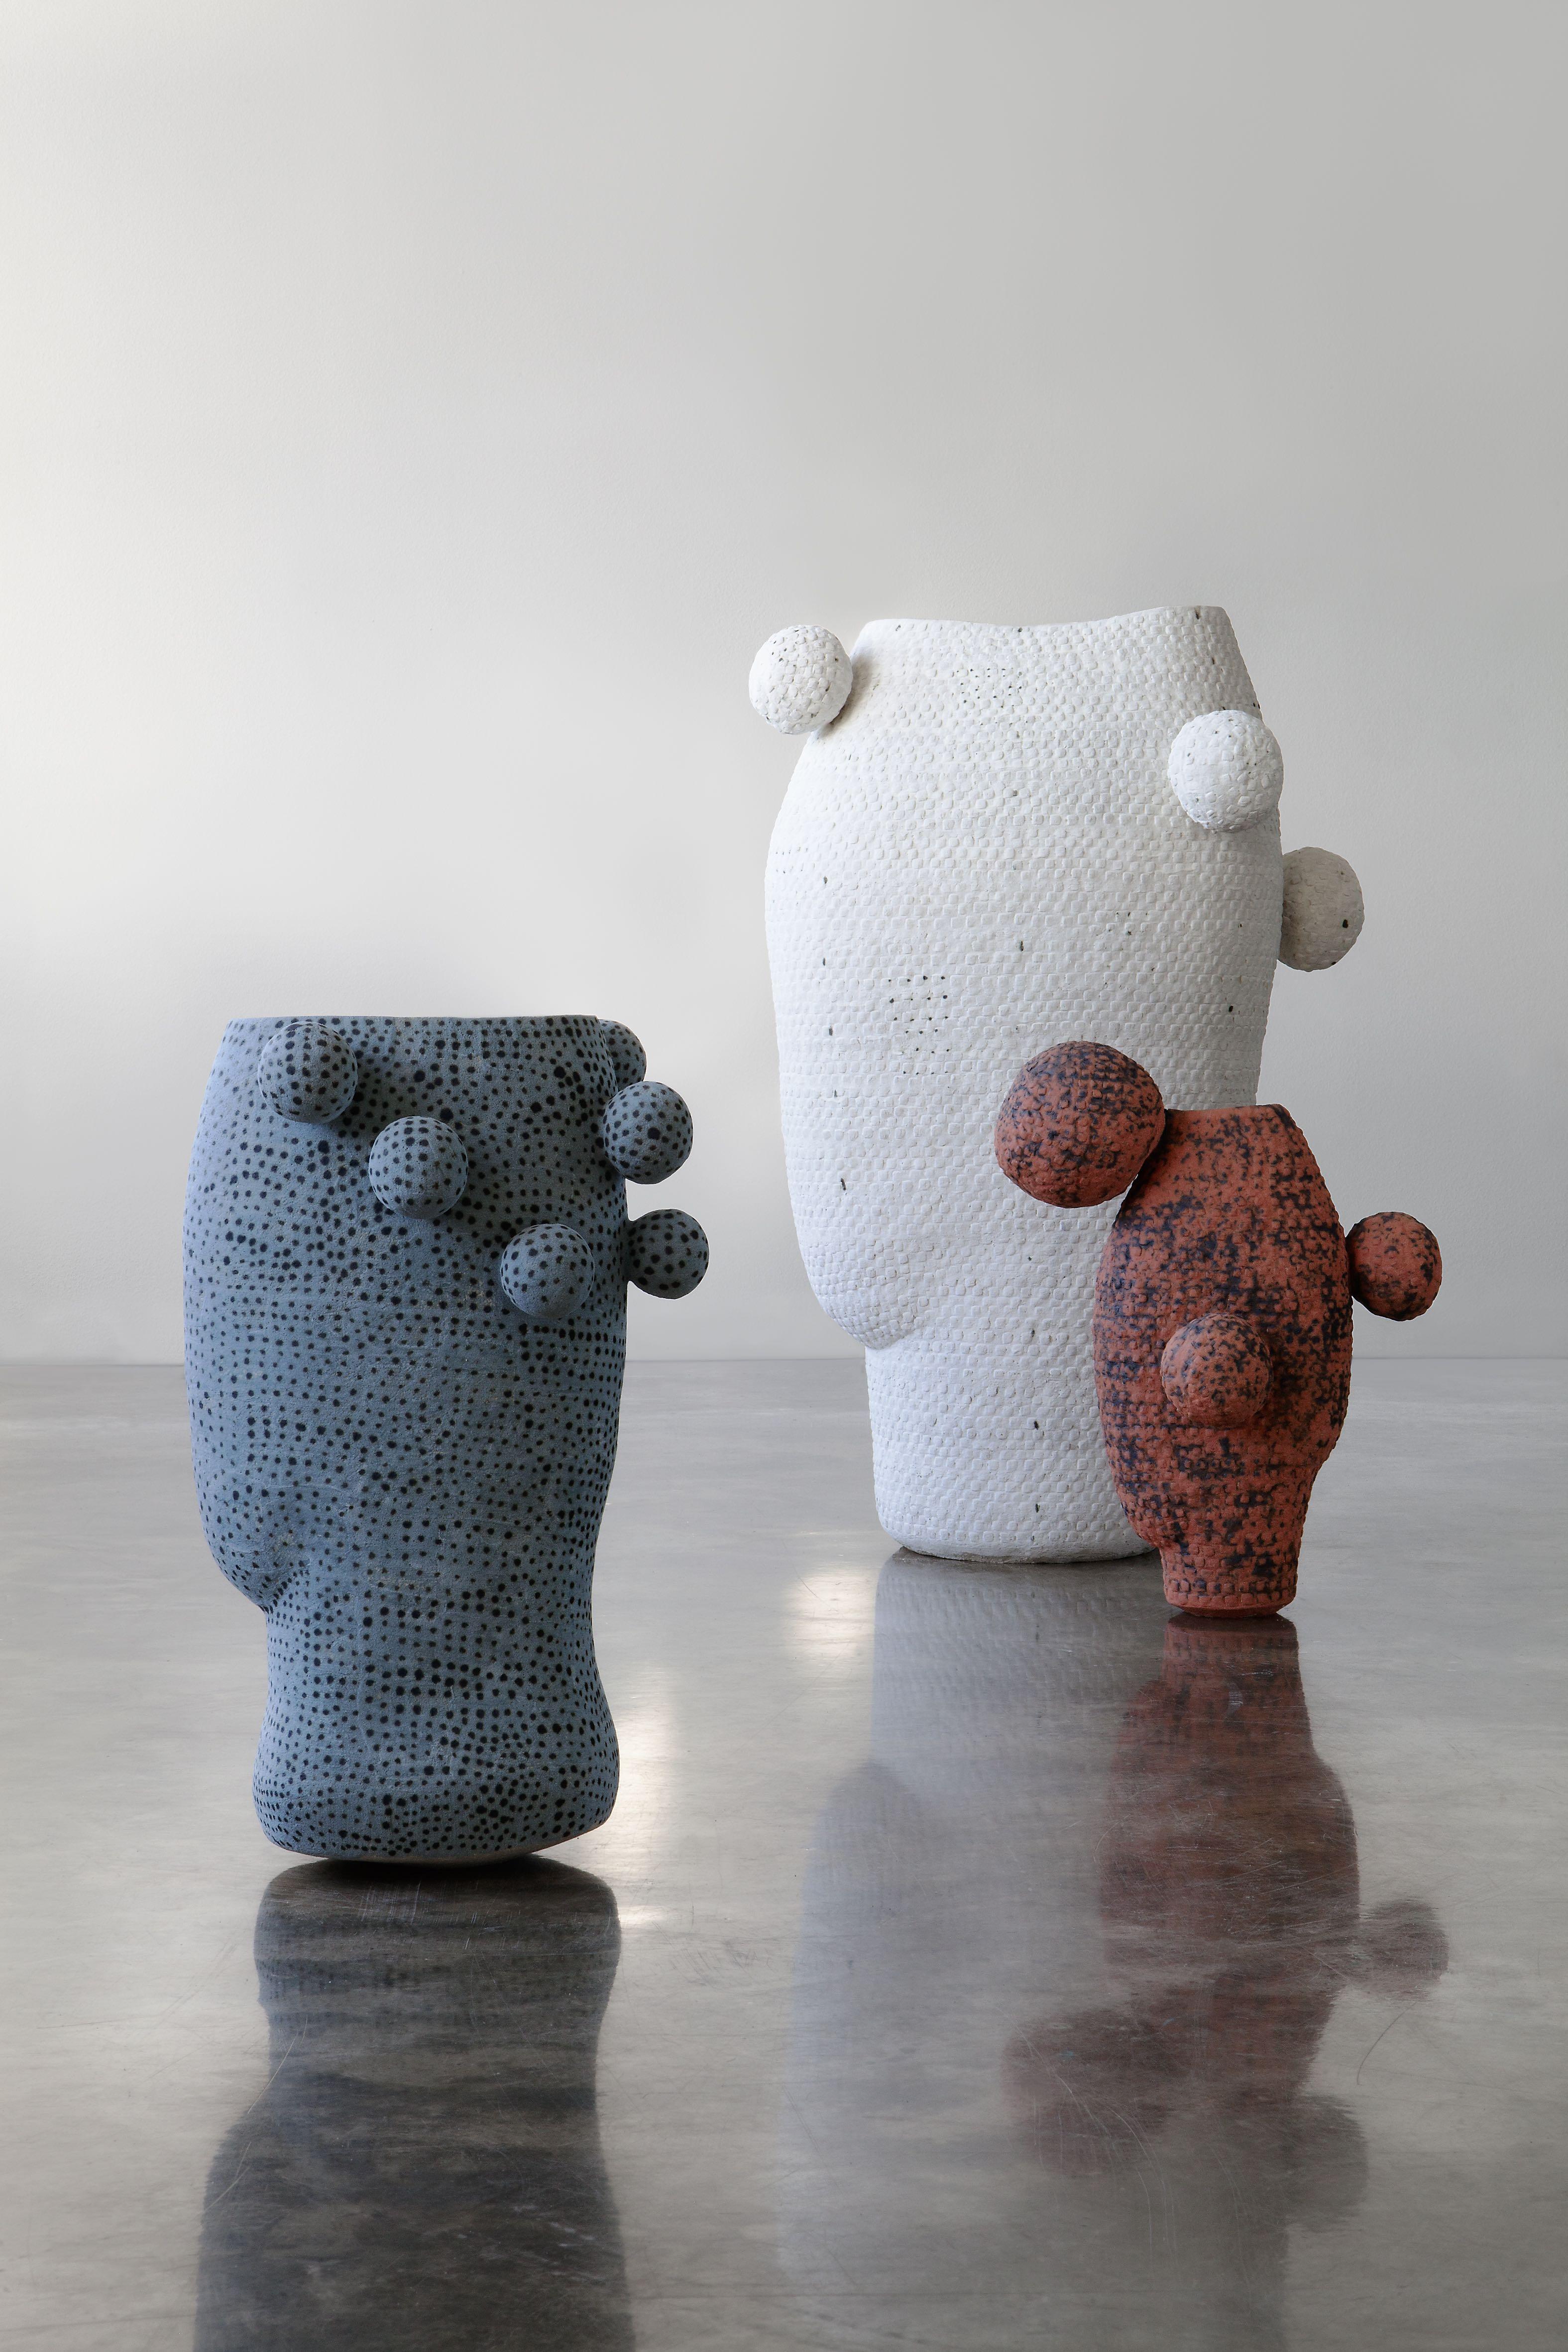 DesignMiami/ Basel 2019: Hostler Burrows présente Kristina Riska.